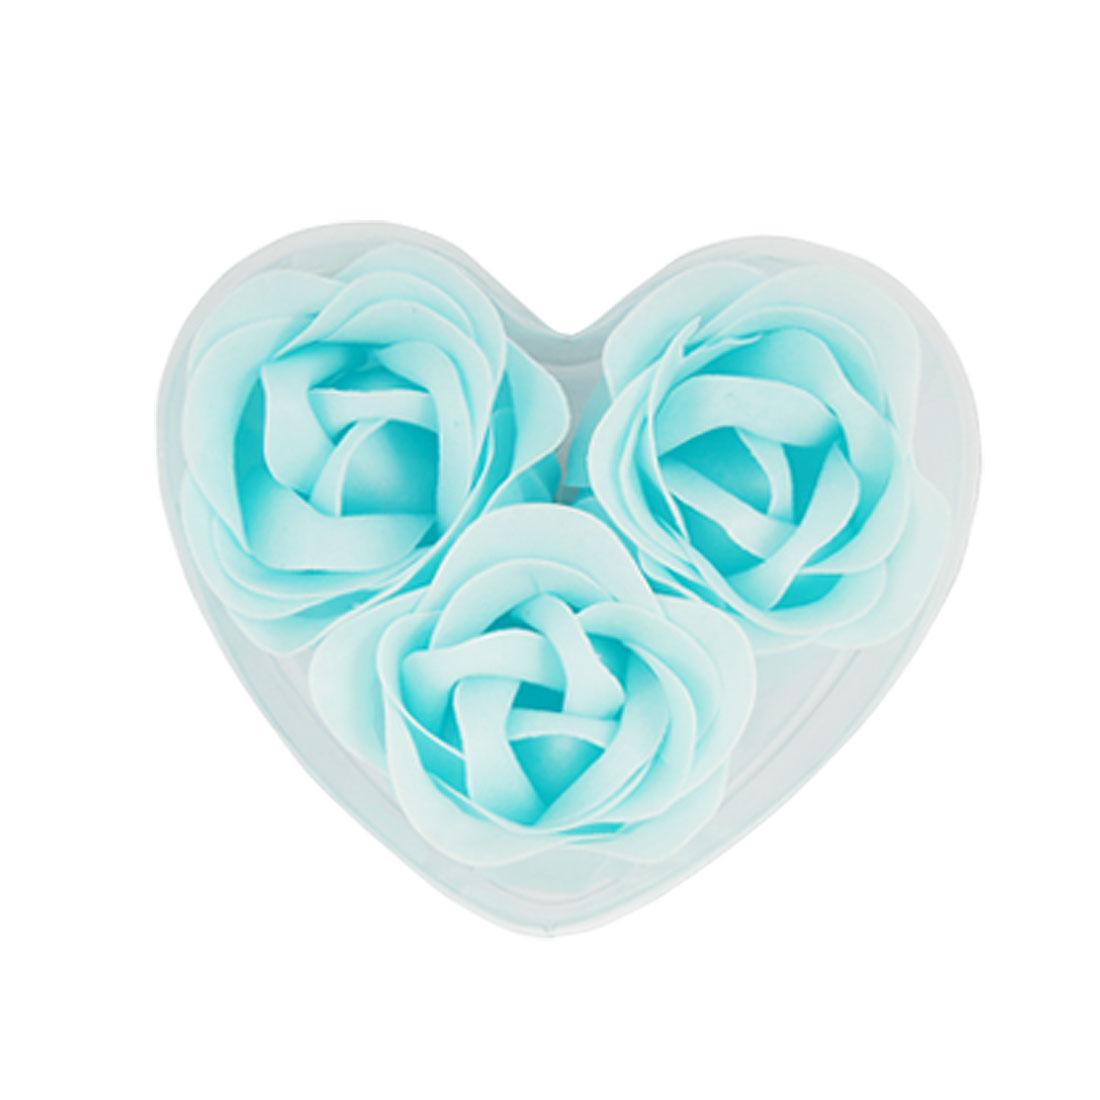 3 Pcs Rose Shaped Baby Blue Bath Soap Petals w Heart Package Box